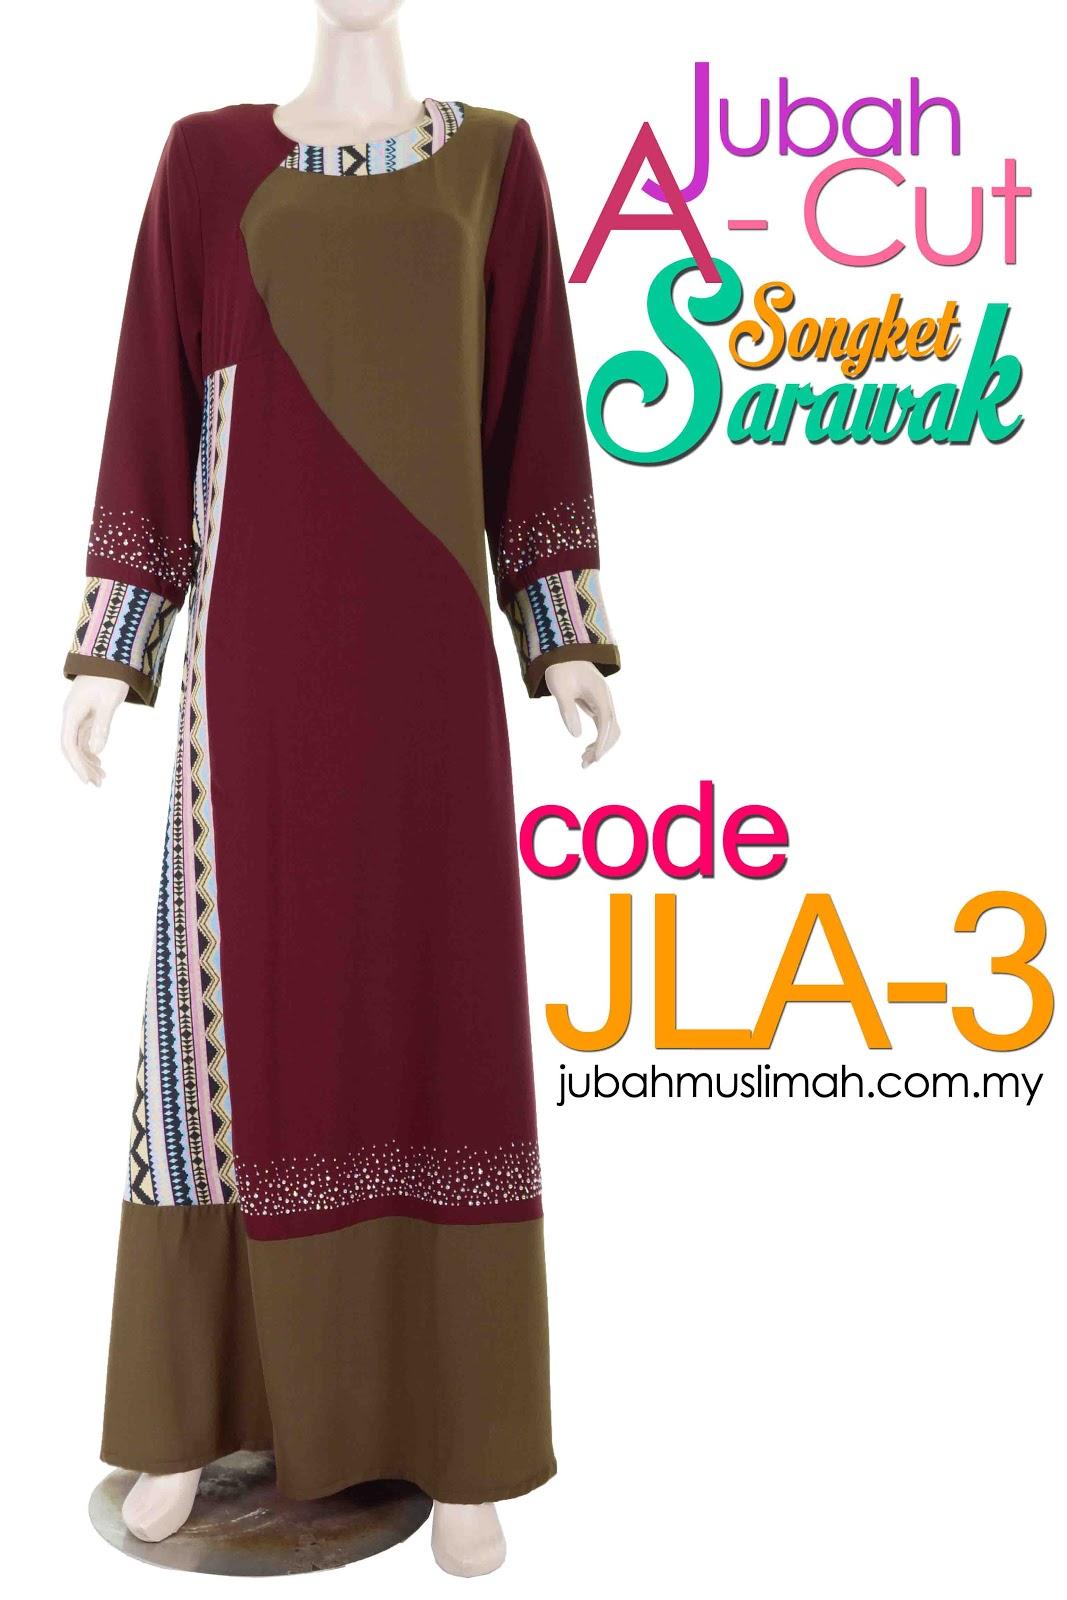 Jubah songket sarawak newhairstylesformen2014 com